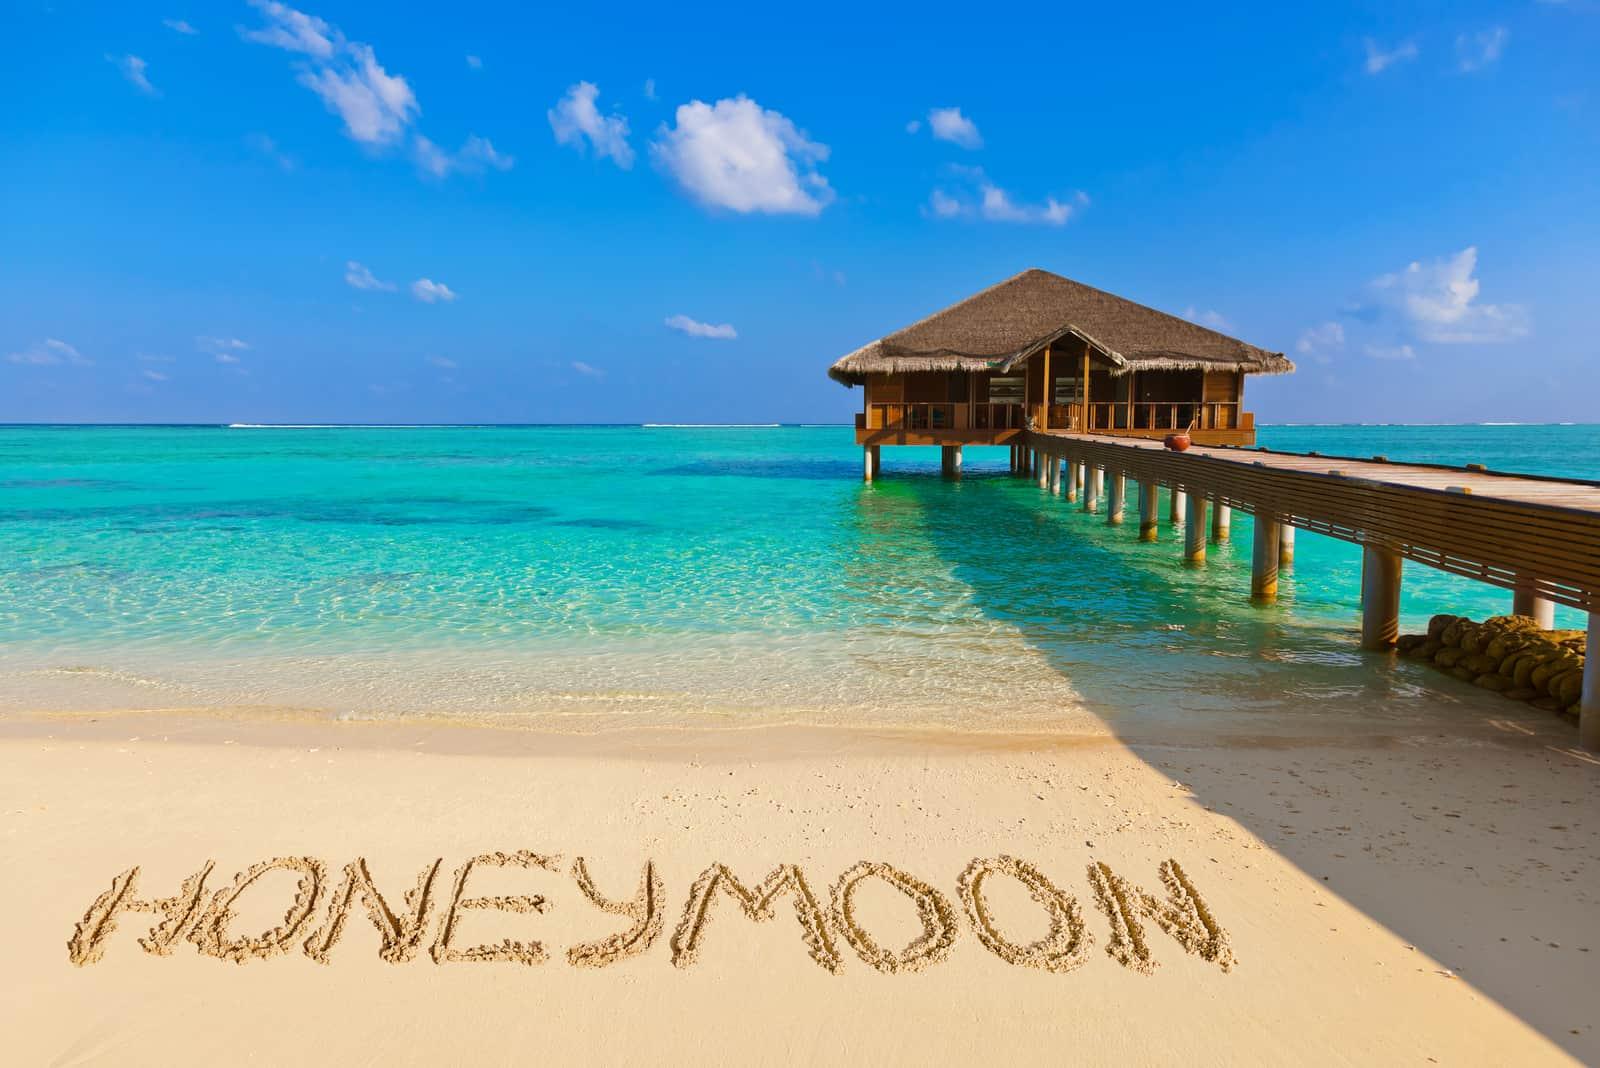 Wort Flitterwochen am Strand